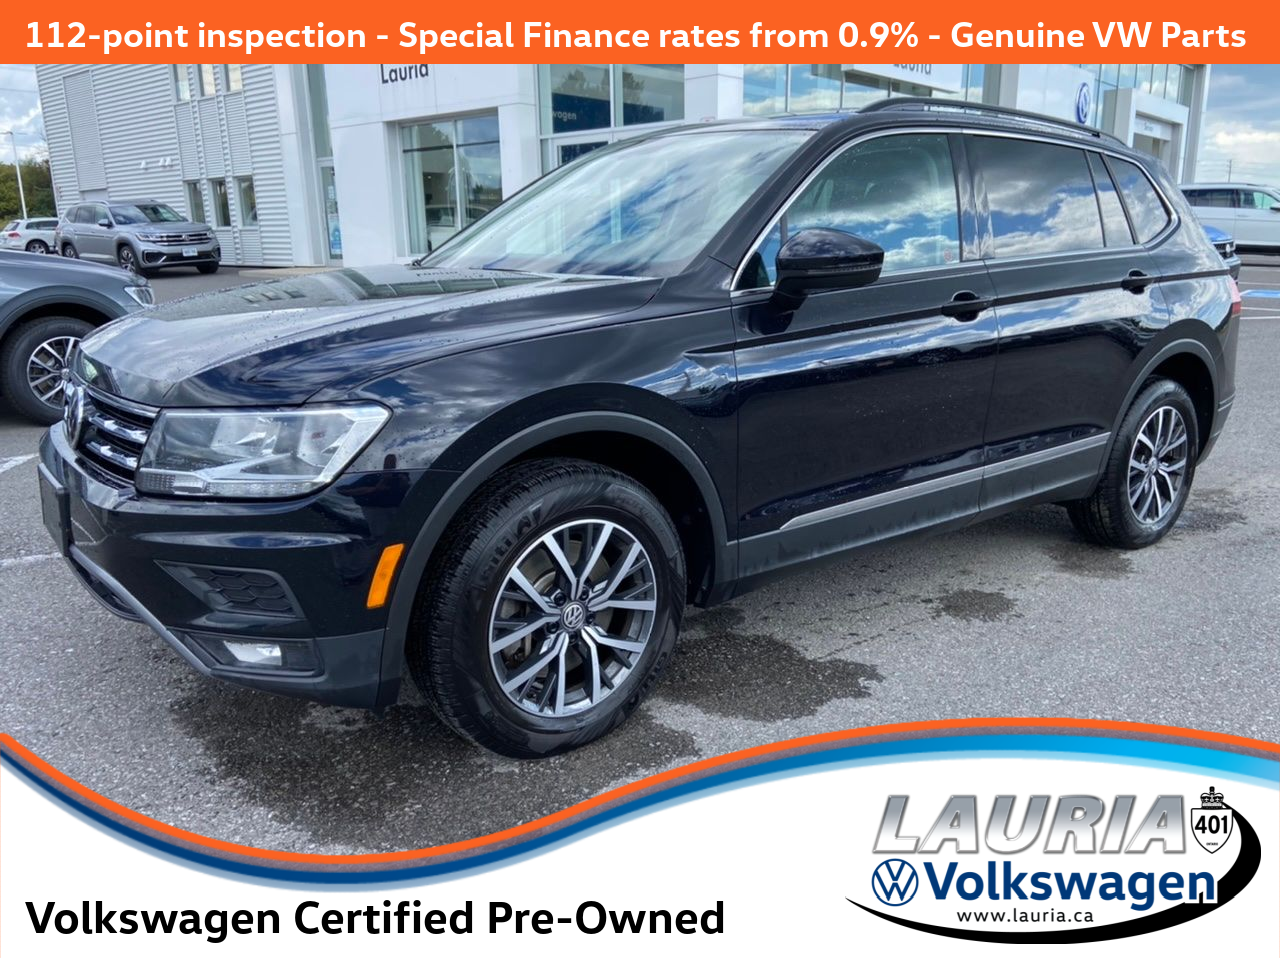 Certified Pre-Owned 2019 Volkswagen Tiguan 2.0T Comfortline 4Motion AWD - LOW KMS